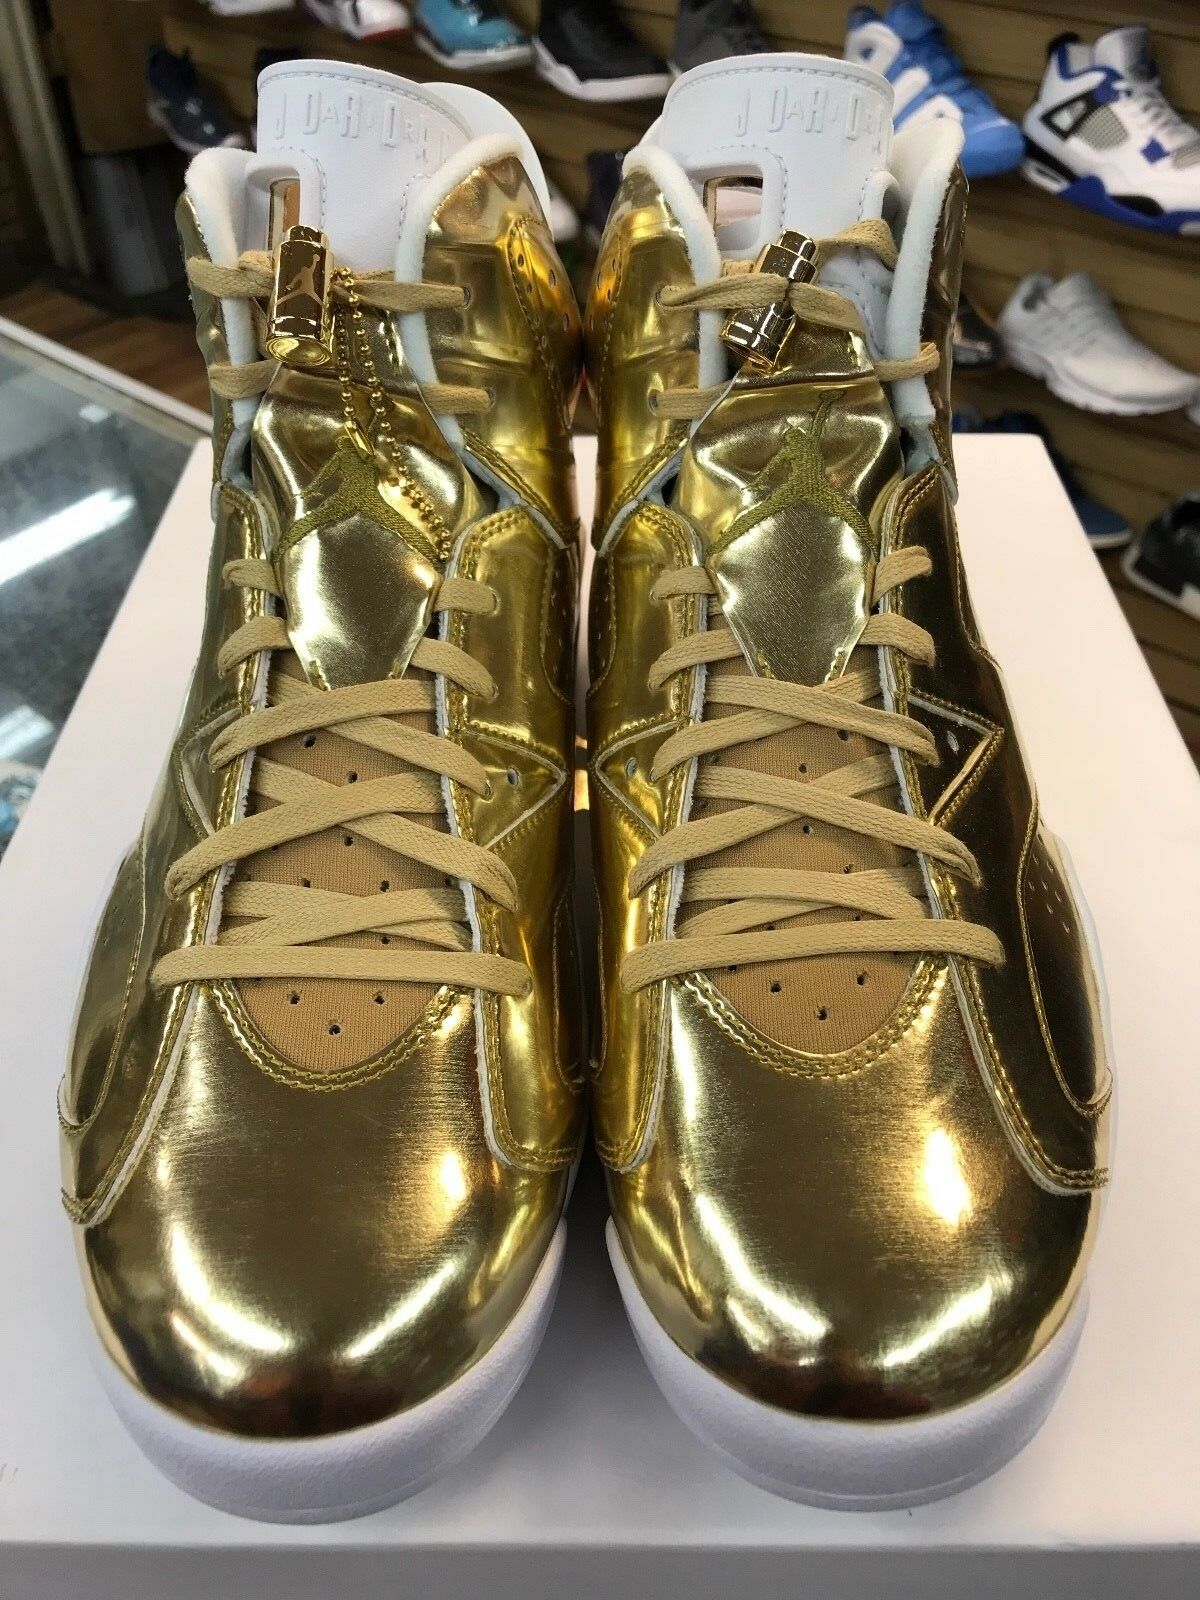 Mens Air Jordan 6 Retro Pinnacle Metallic gold Wht 854271-730 100%Authentic